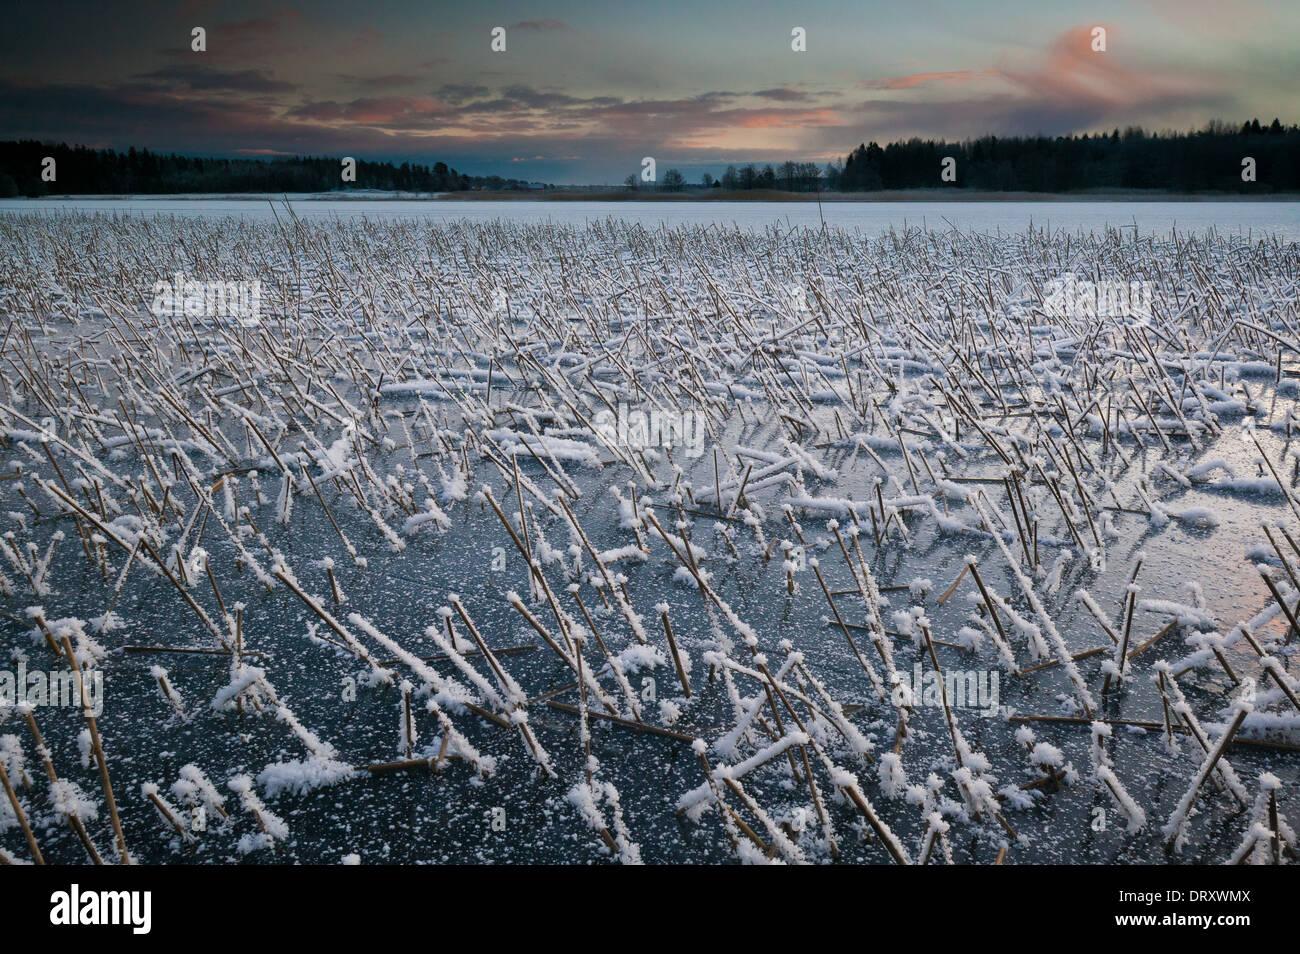 Ance congelati all'alba, a Vanemfjorden nel lago Vansjø, Østfold fylke, Norvegia. Immagini Stock